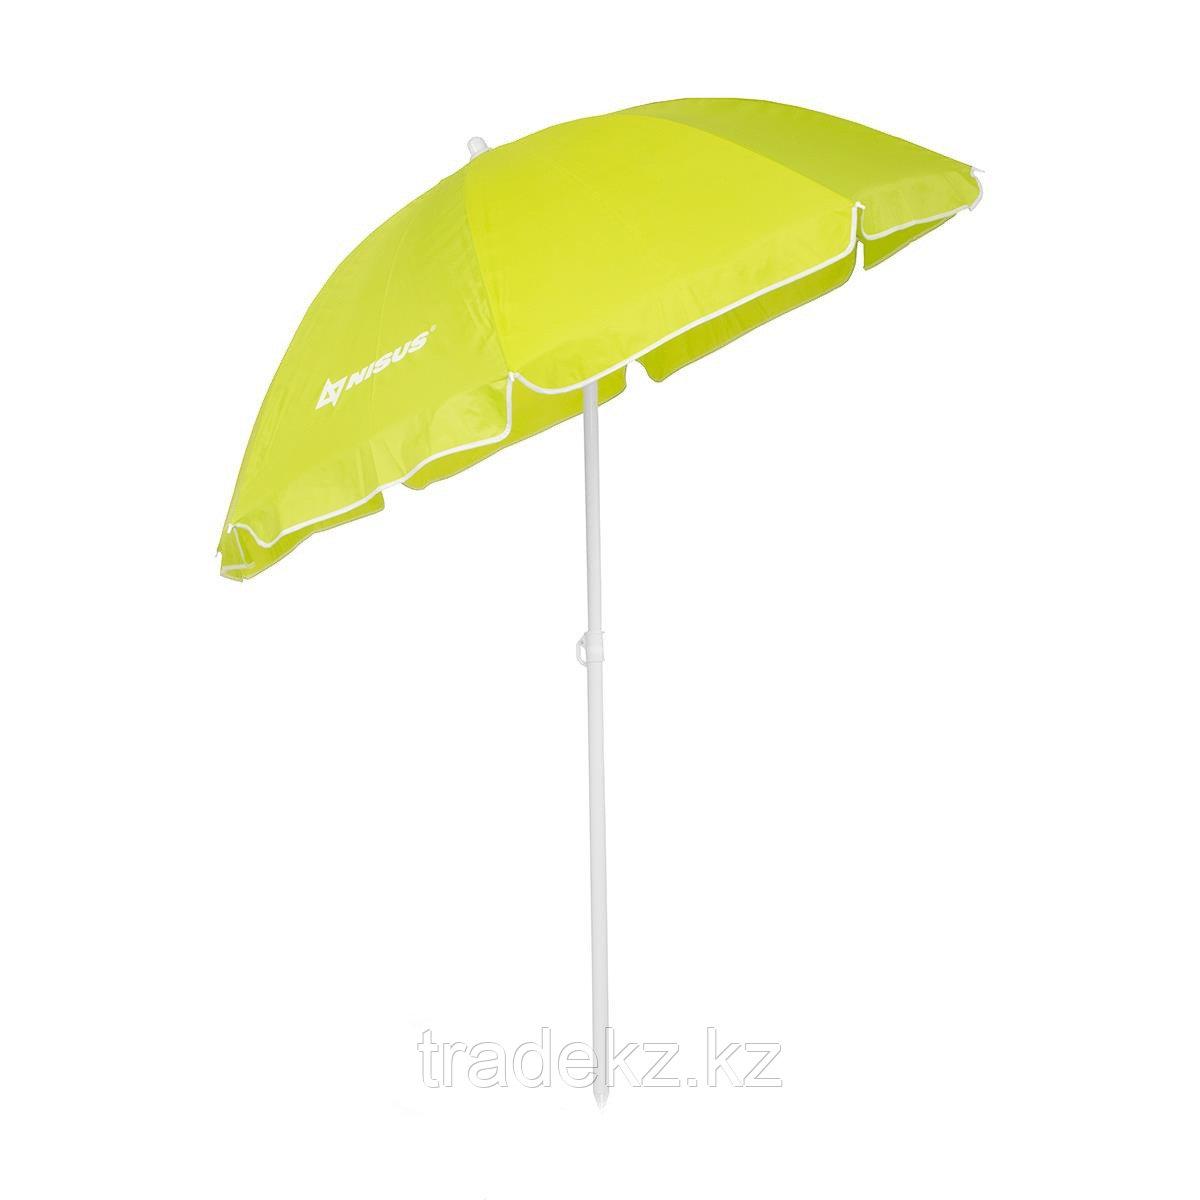 Зонт пляжный ТОНАР NISUS N-200N с наклоном